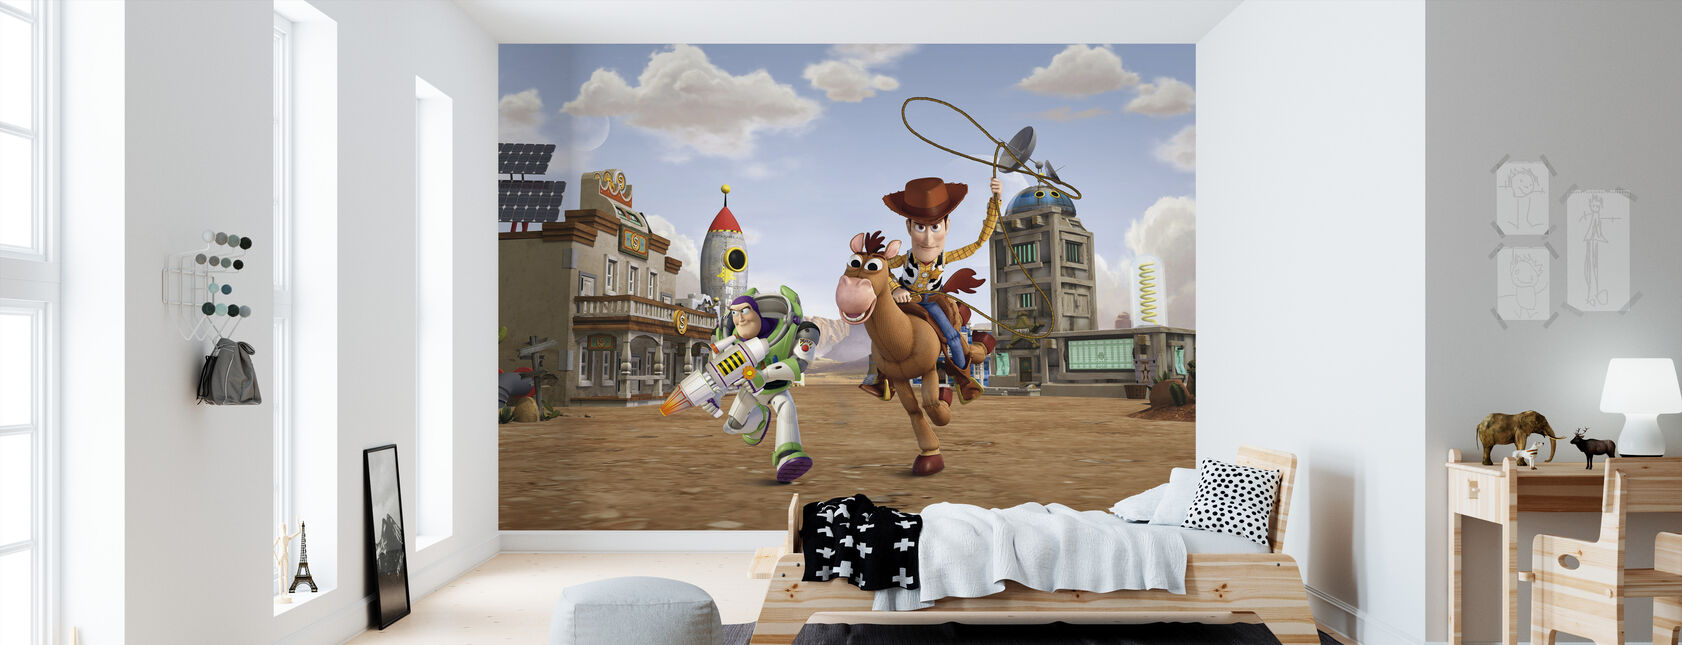 Toy Story - Napakymppi Woody Buzz Lightyear - Tapetti - Lastenhuone